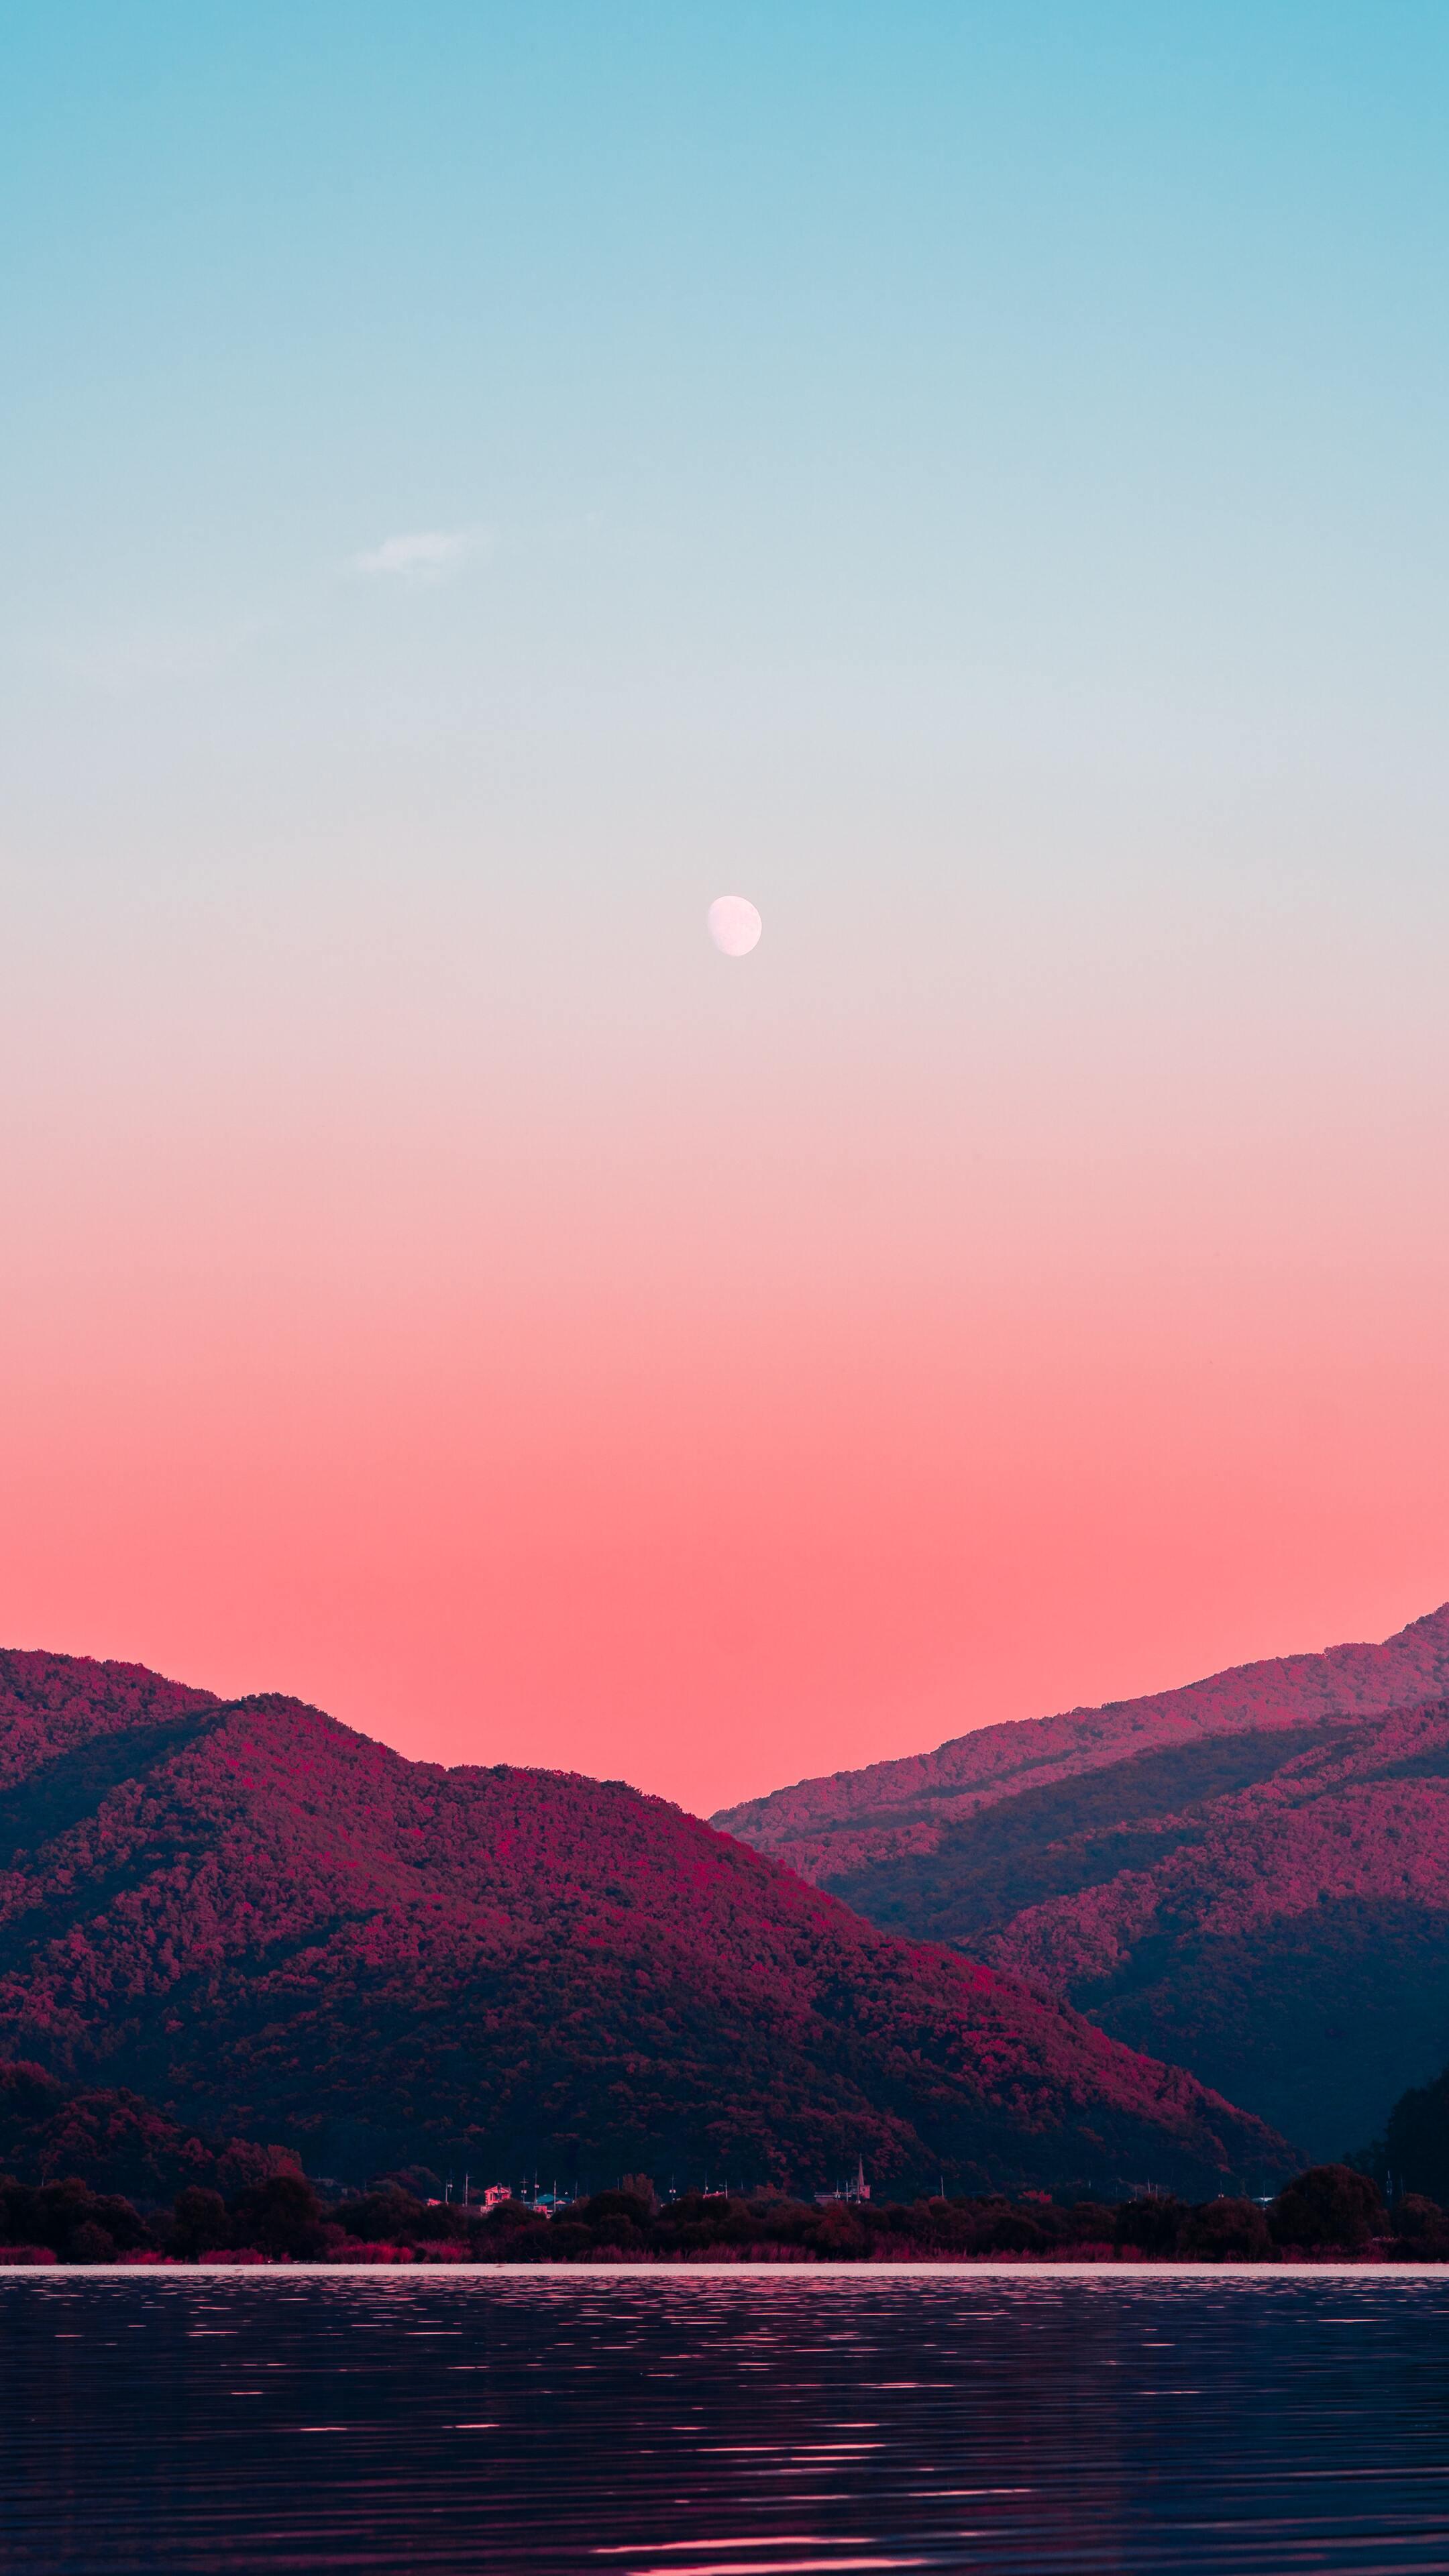 autumn-landscape-4k-lx.jpg